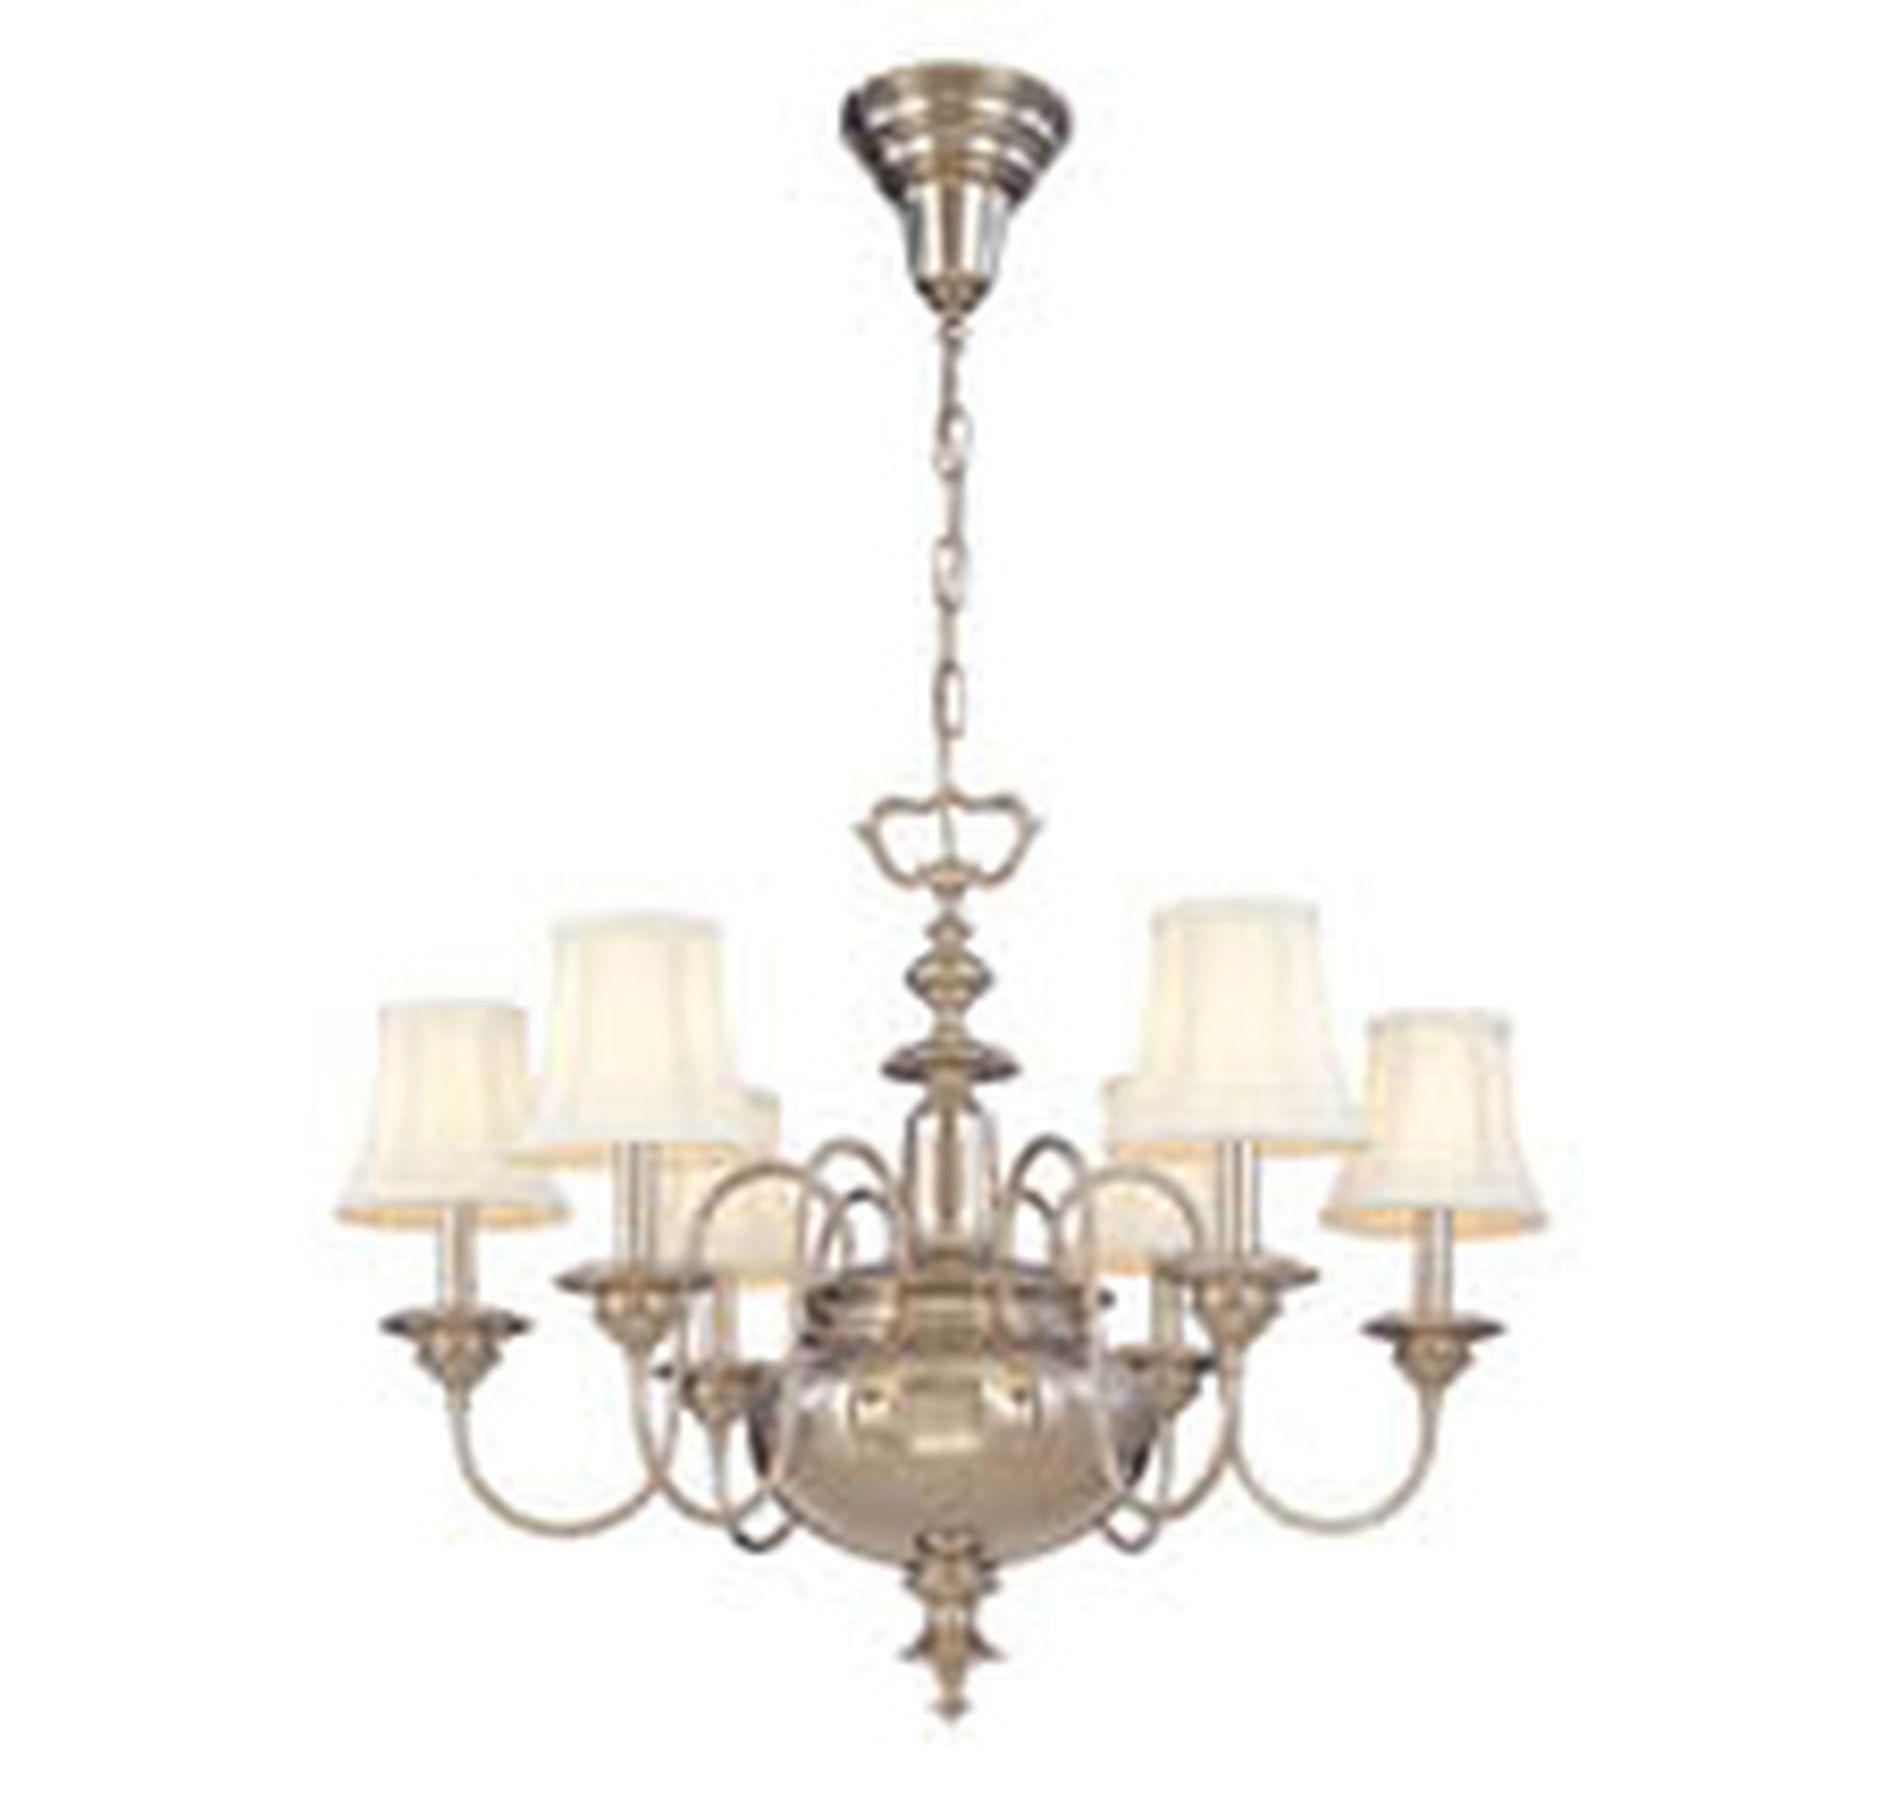 Hudson valley yorktown chandelier in ceiling lights chandeliers hudson valley yorktown chandelier in ceiling lights chandeliers indoor chandeliers progressivelighting mozeypictures Gallery